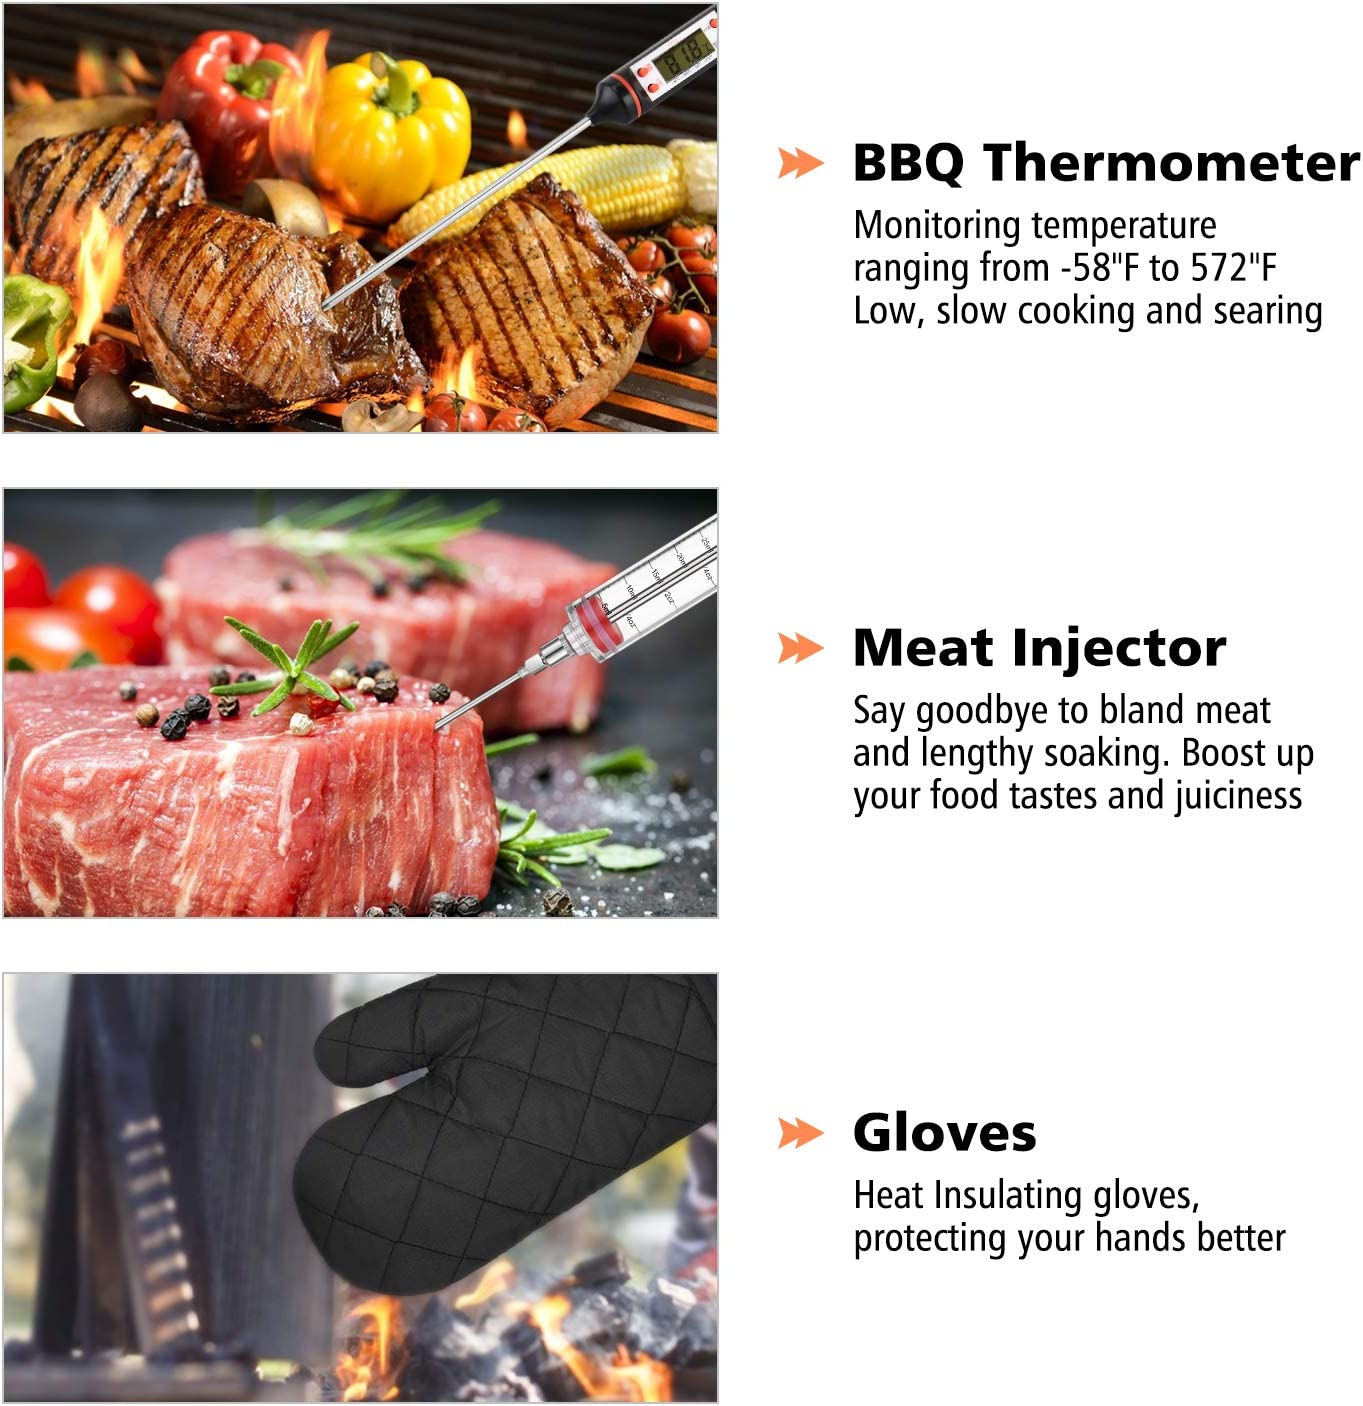 One Sight 27pcs Accessoires pour Barbecue /à Griller Ustensiles Barbecue Portables en Acier Inoxydable pour Camping BBQ